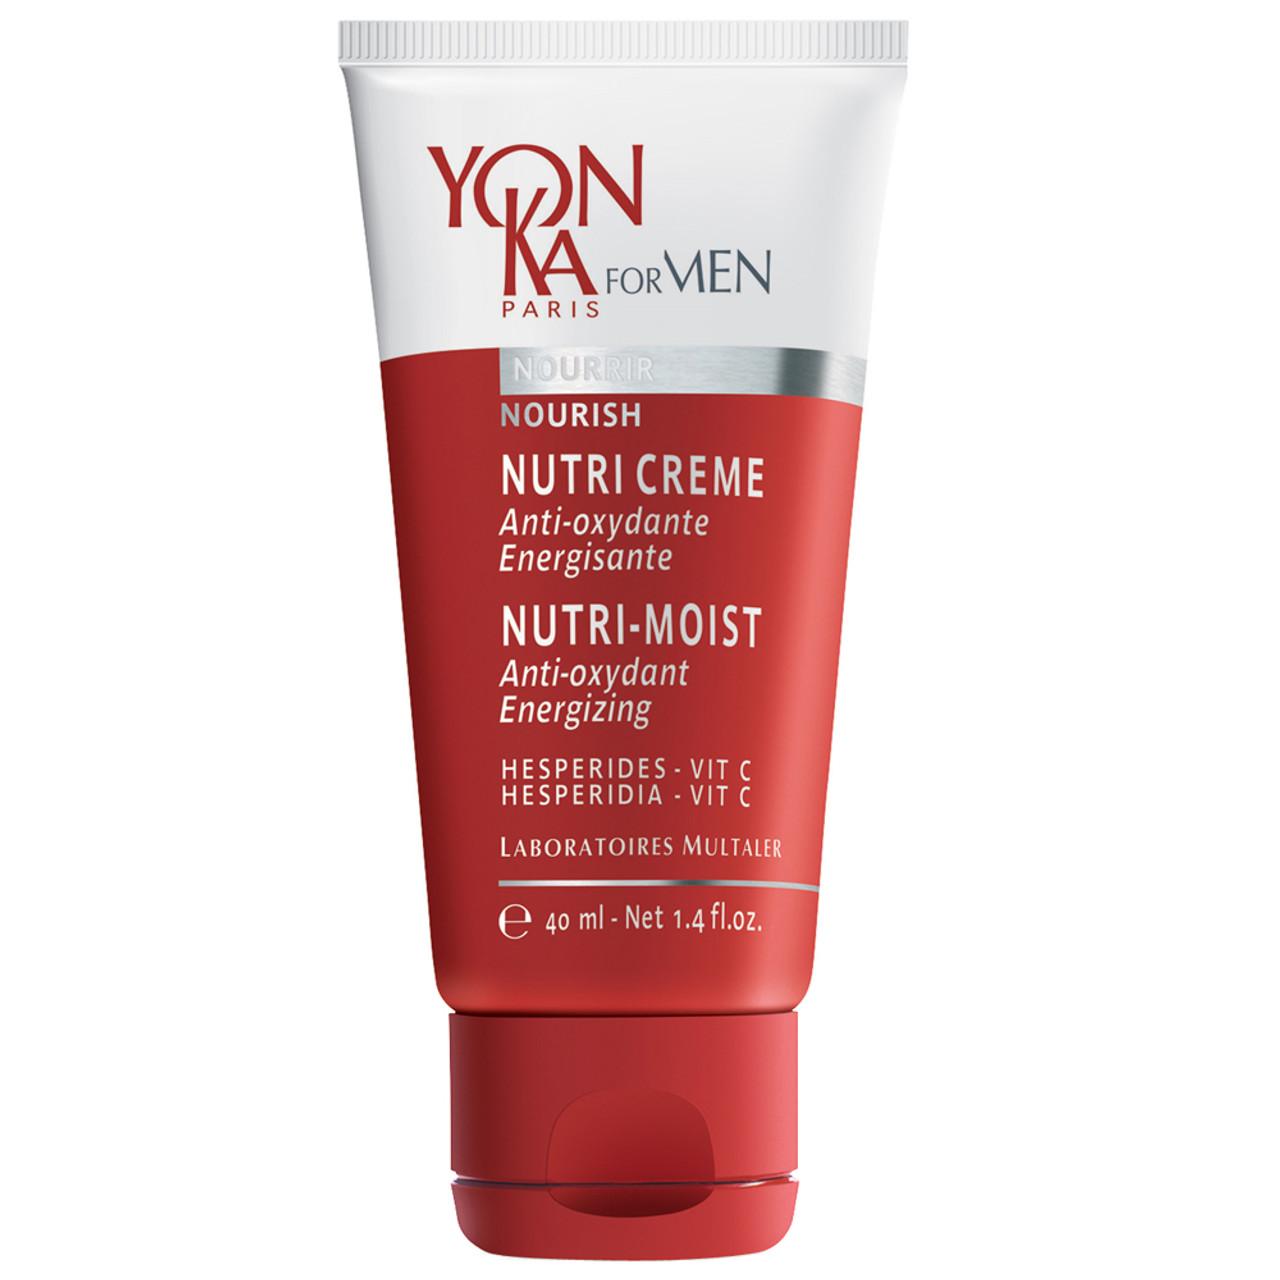 YonKa Nutri-Creme BeautifiedYou.com